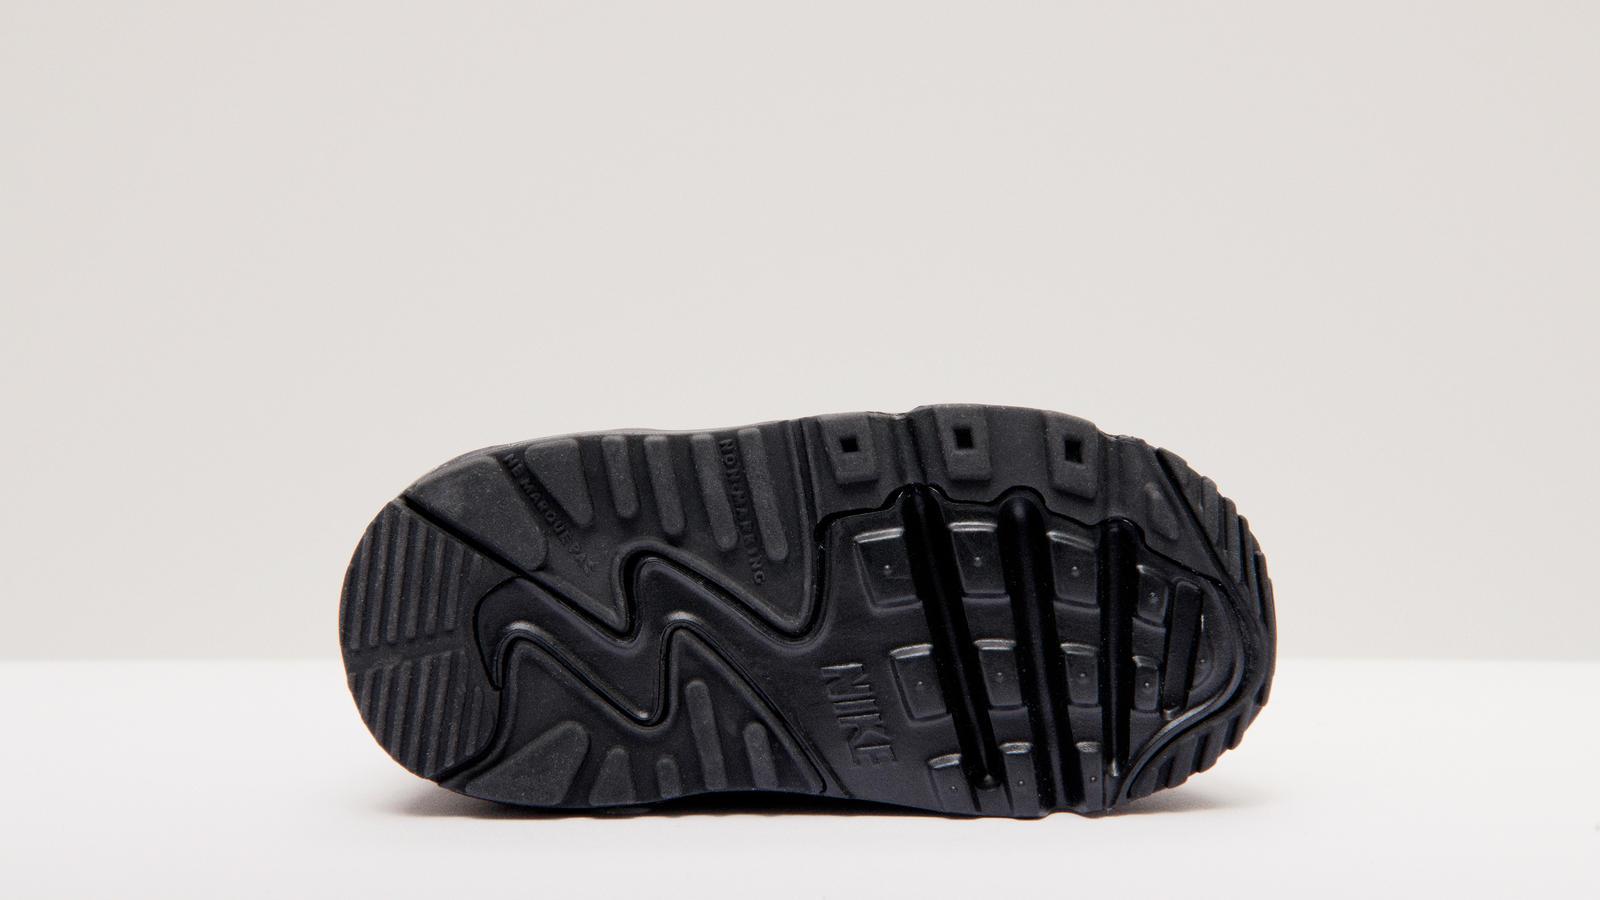 OFF-White Nike Air Max 90 Kids Sizes